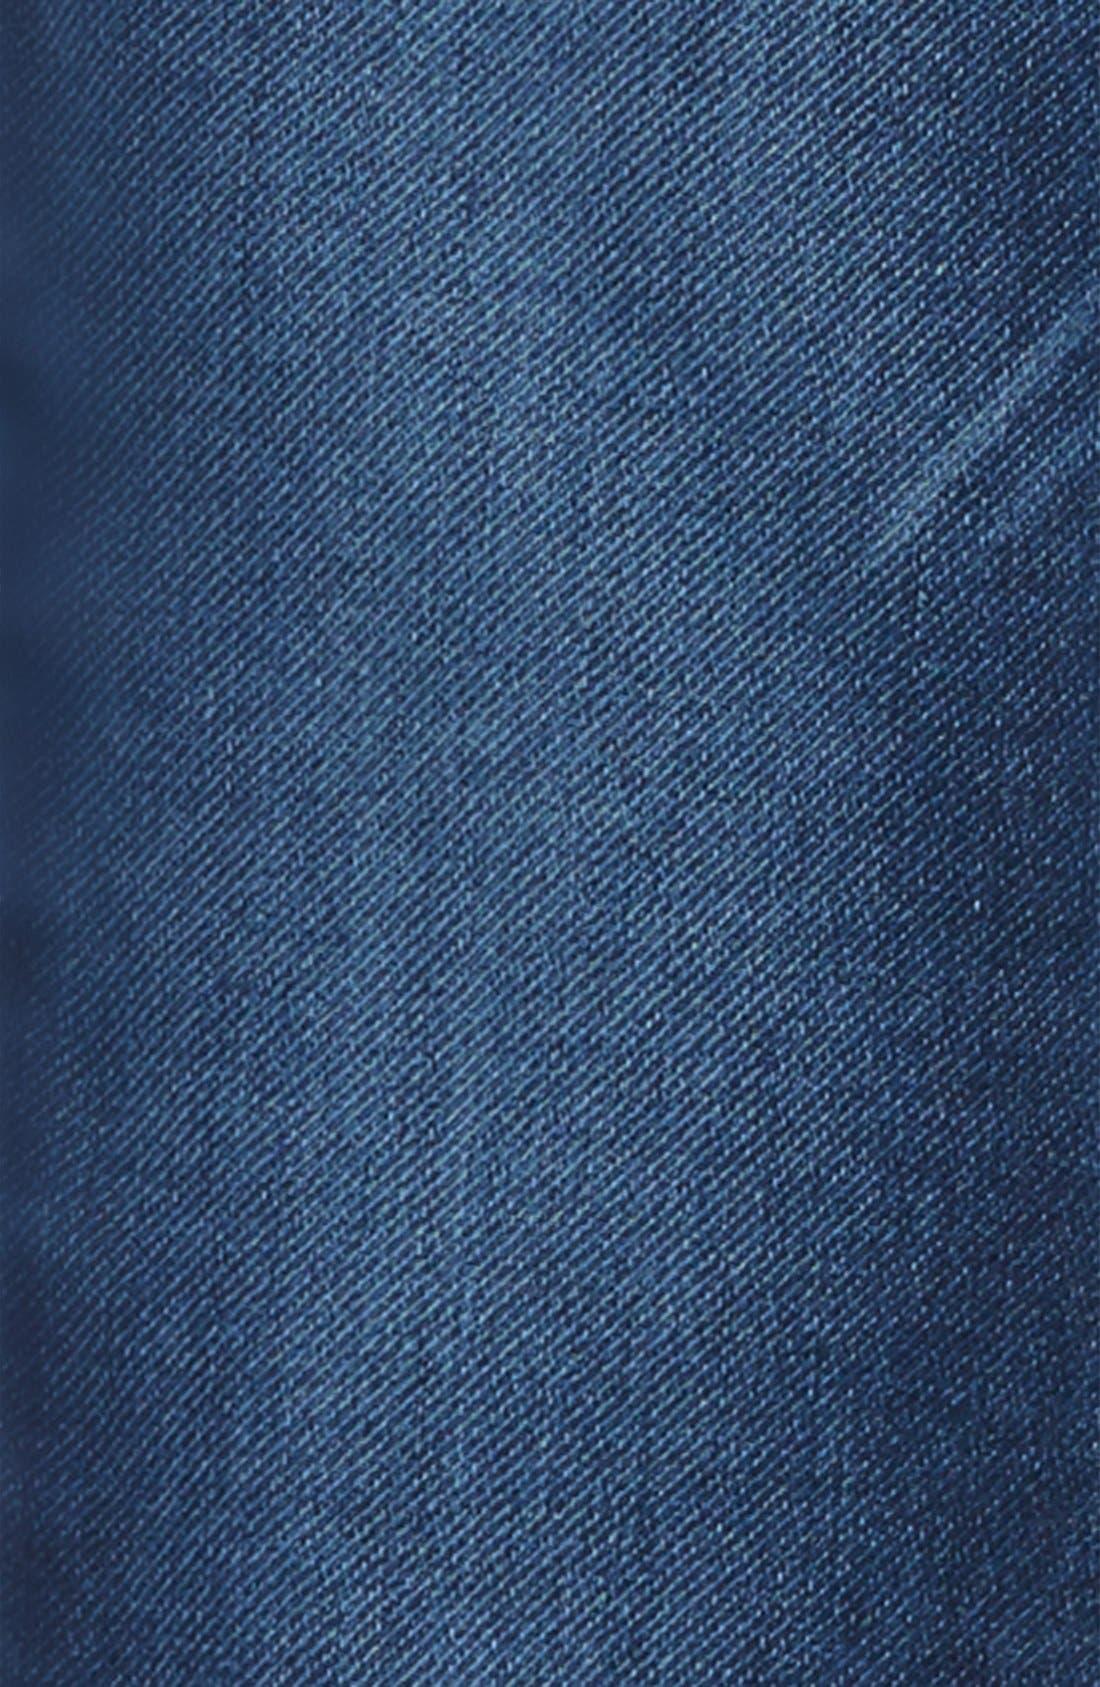 Alternate Image 3  - True Religion Brand Jeans 'Knit Sweatpant' Jeans (Toddler Boys & Little Boys)